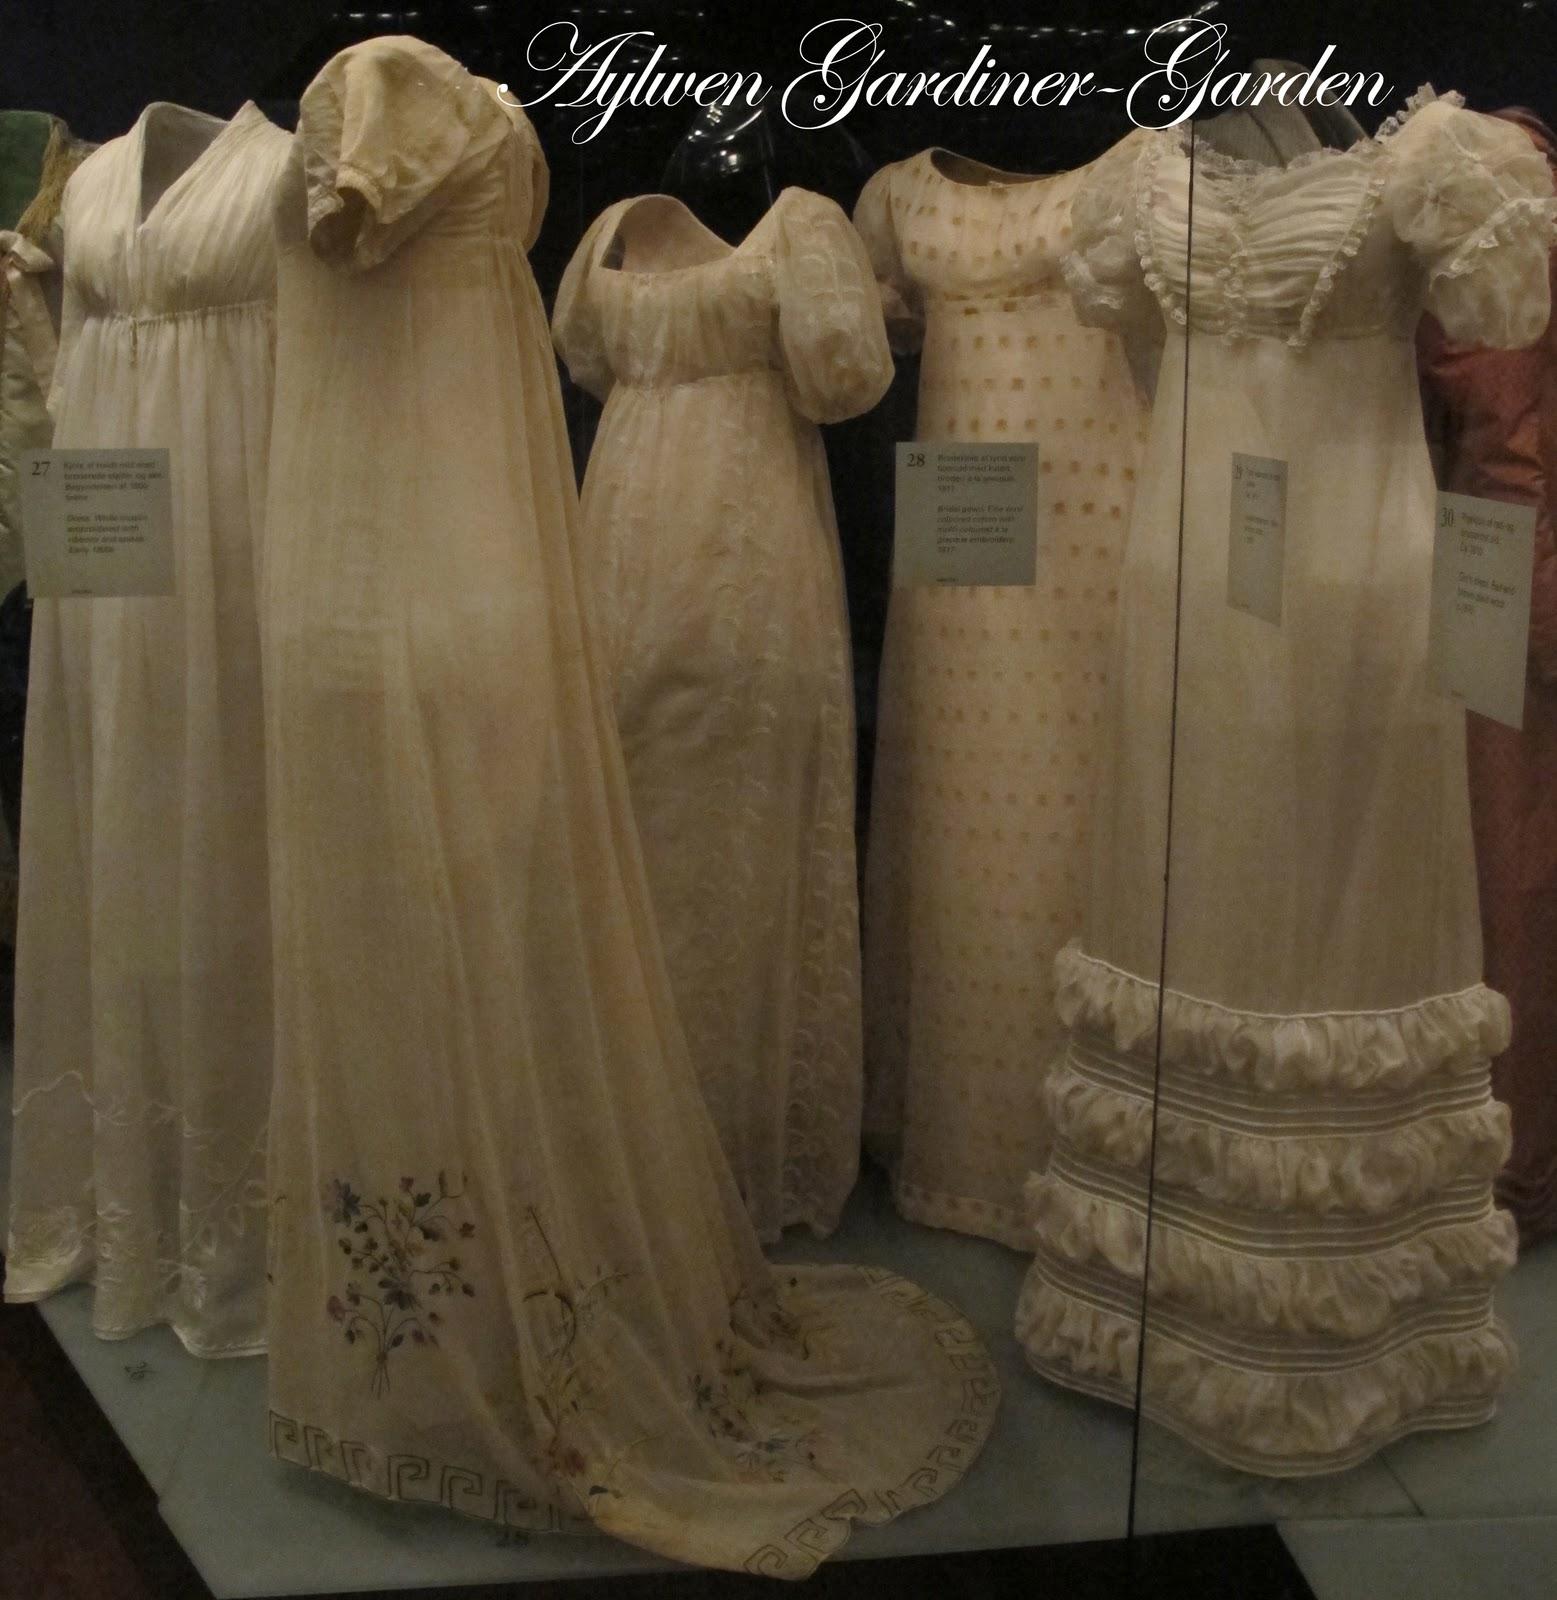 Regency: Aylwen Gardiner-Garden: My Tidens Tøj Regency Gown (updated